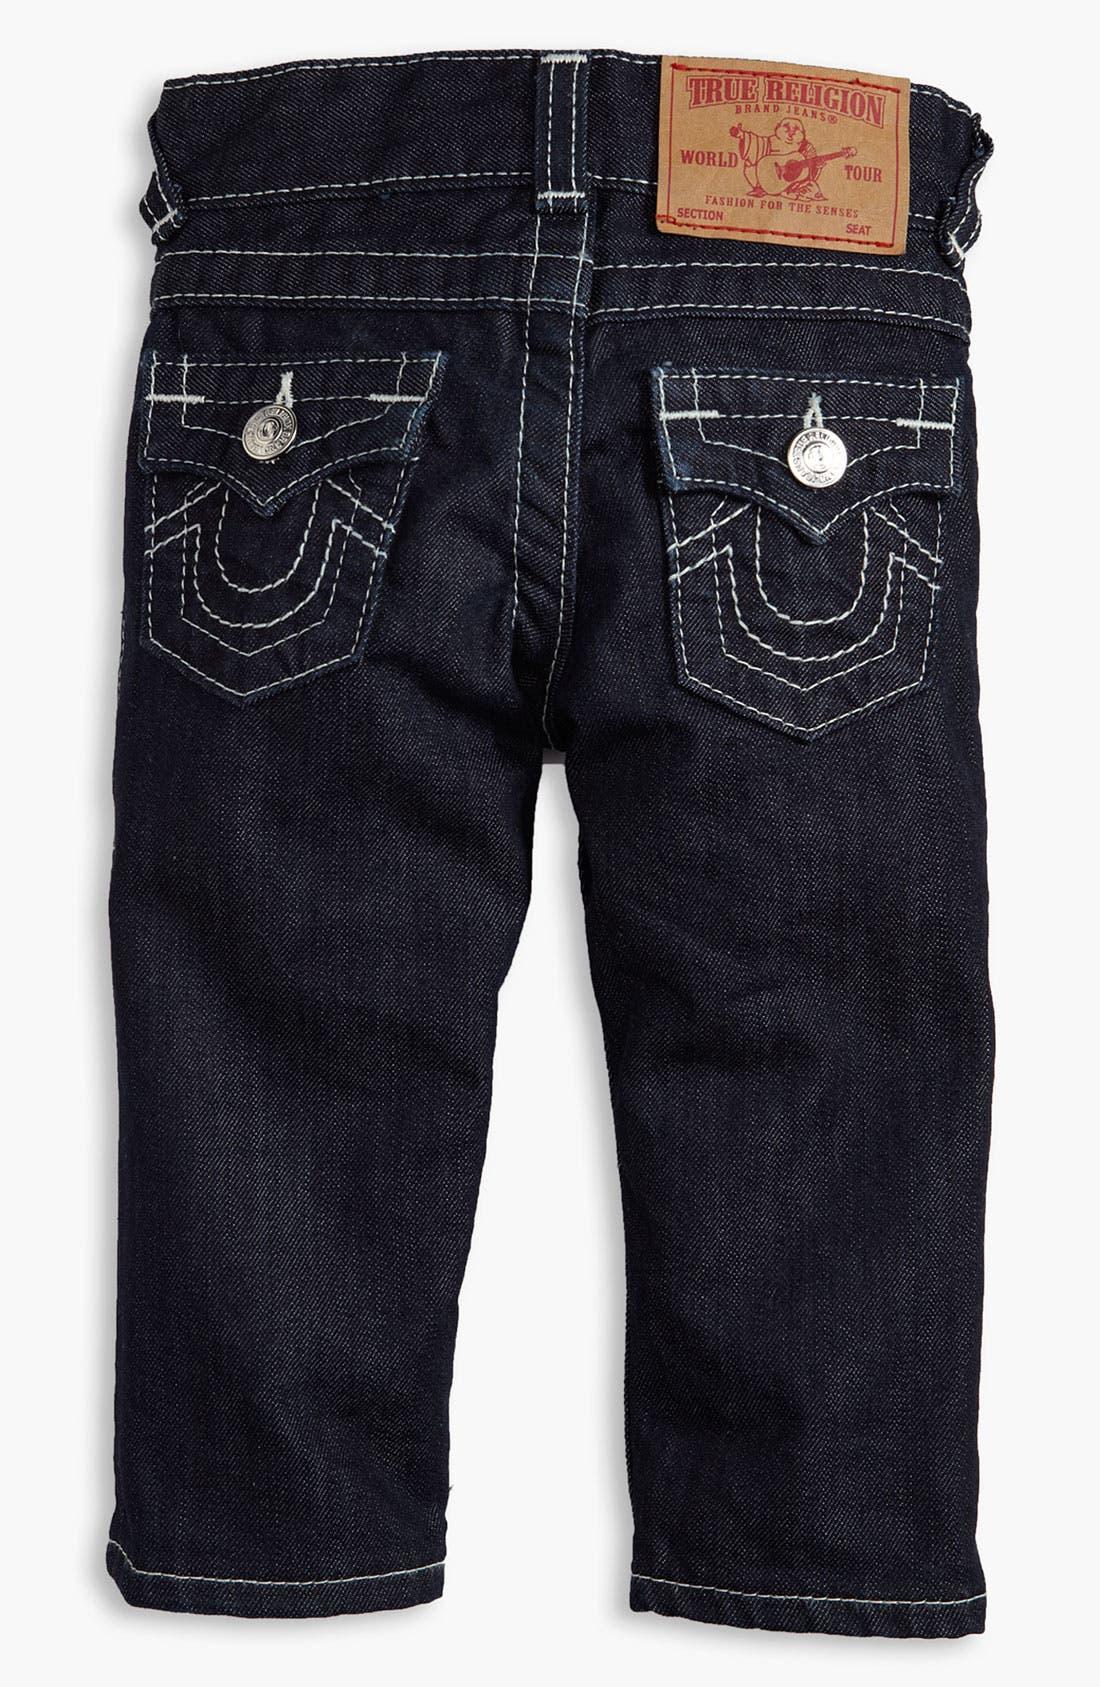 Main Image - True Religion Brand Jeans Straight Leg Jeans (Infant)